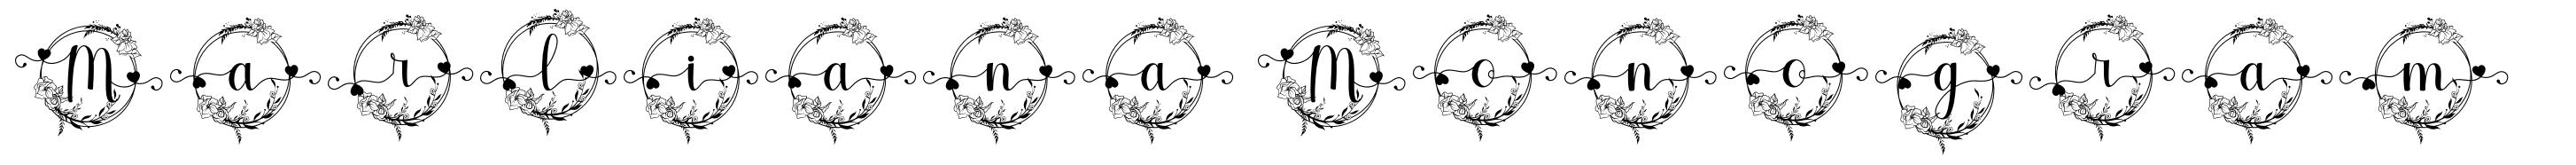 Marliana Monogram font